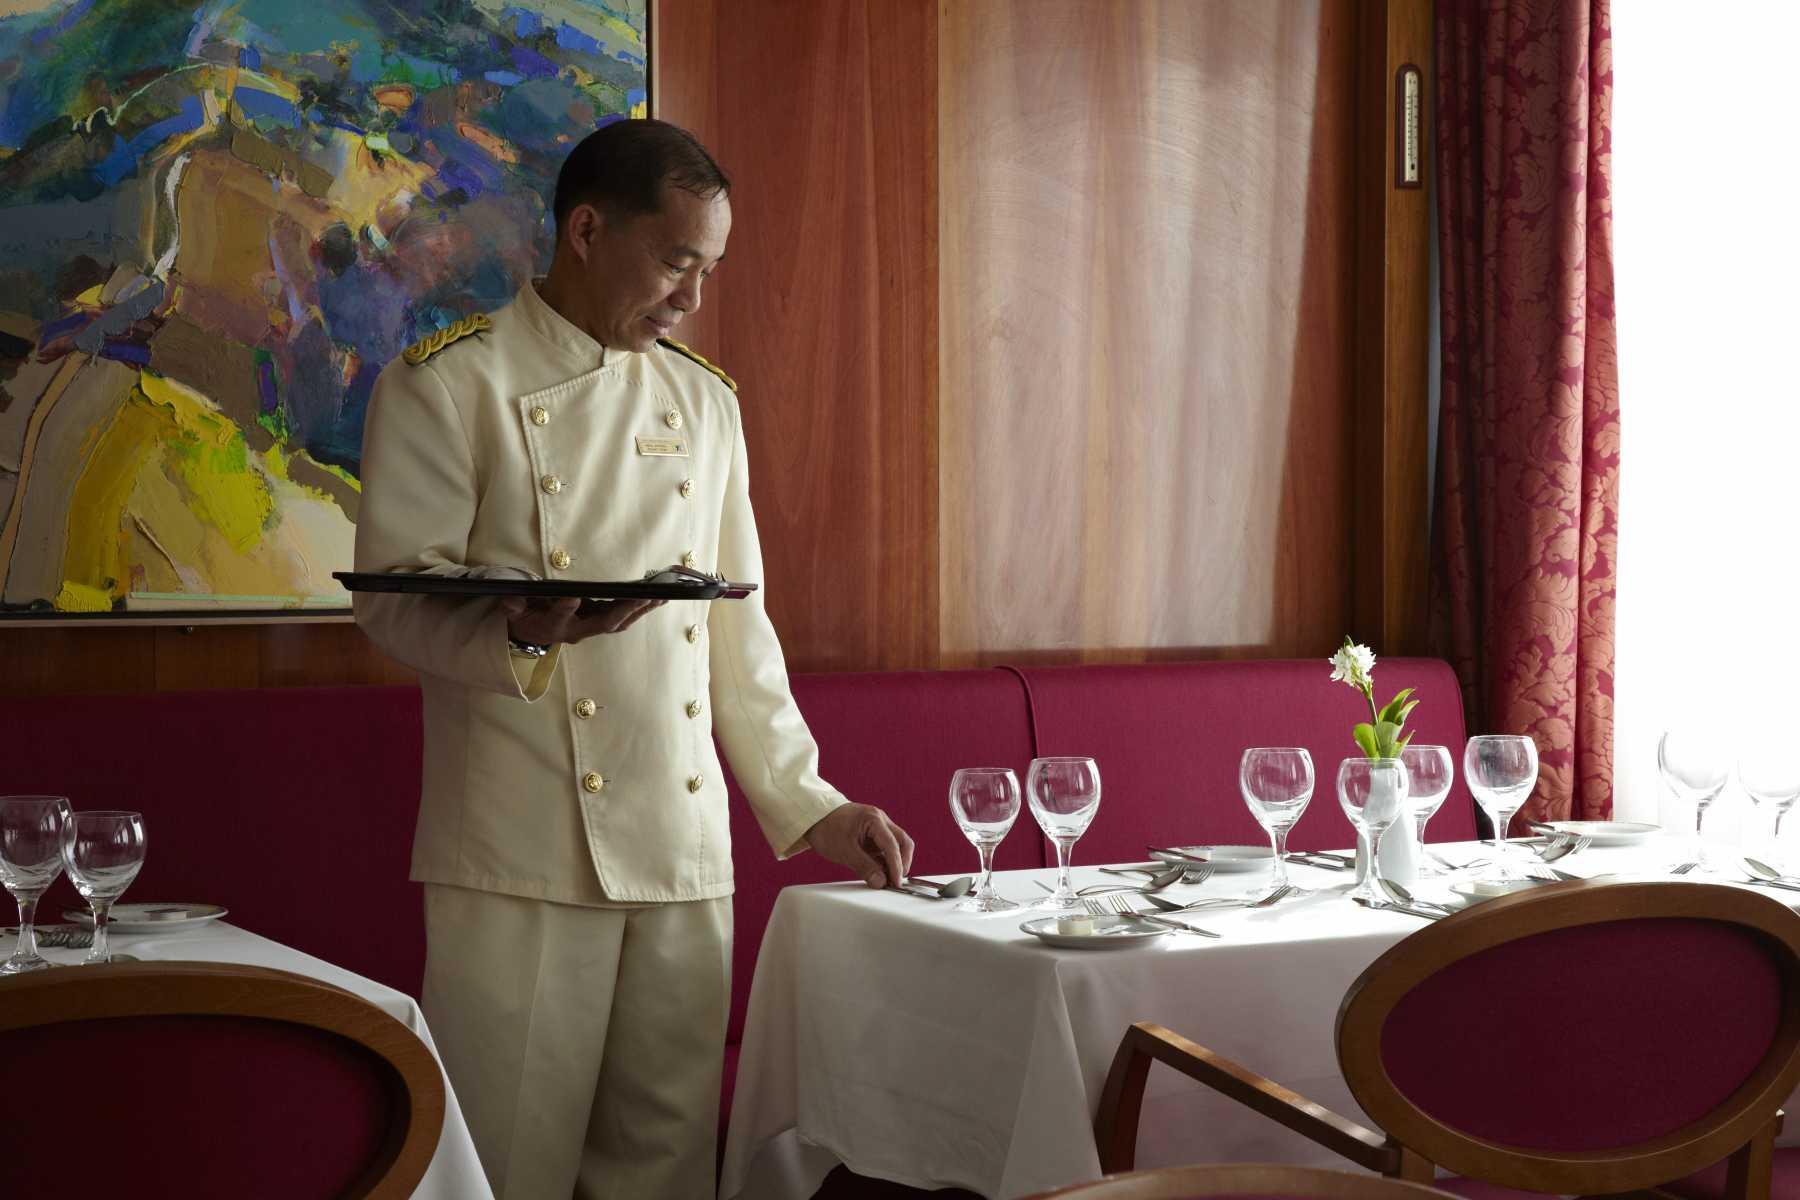 Fred Olsen Cruise Lines Boudicca Interior Tintagel Restaurant 9.jpg